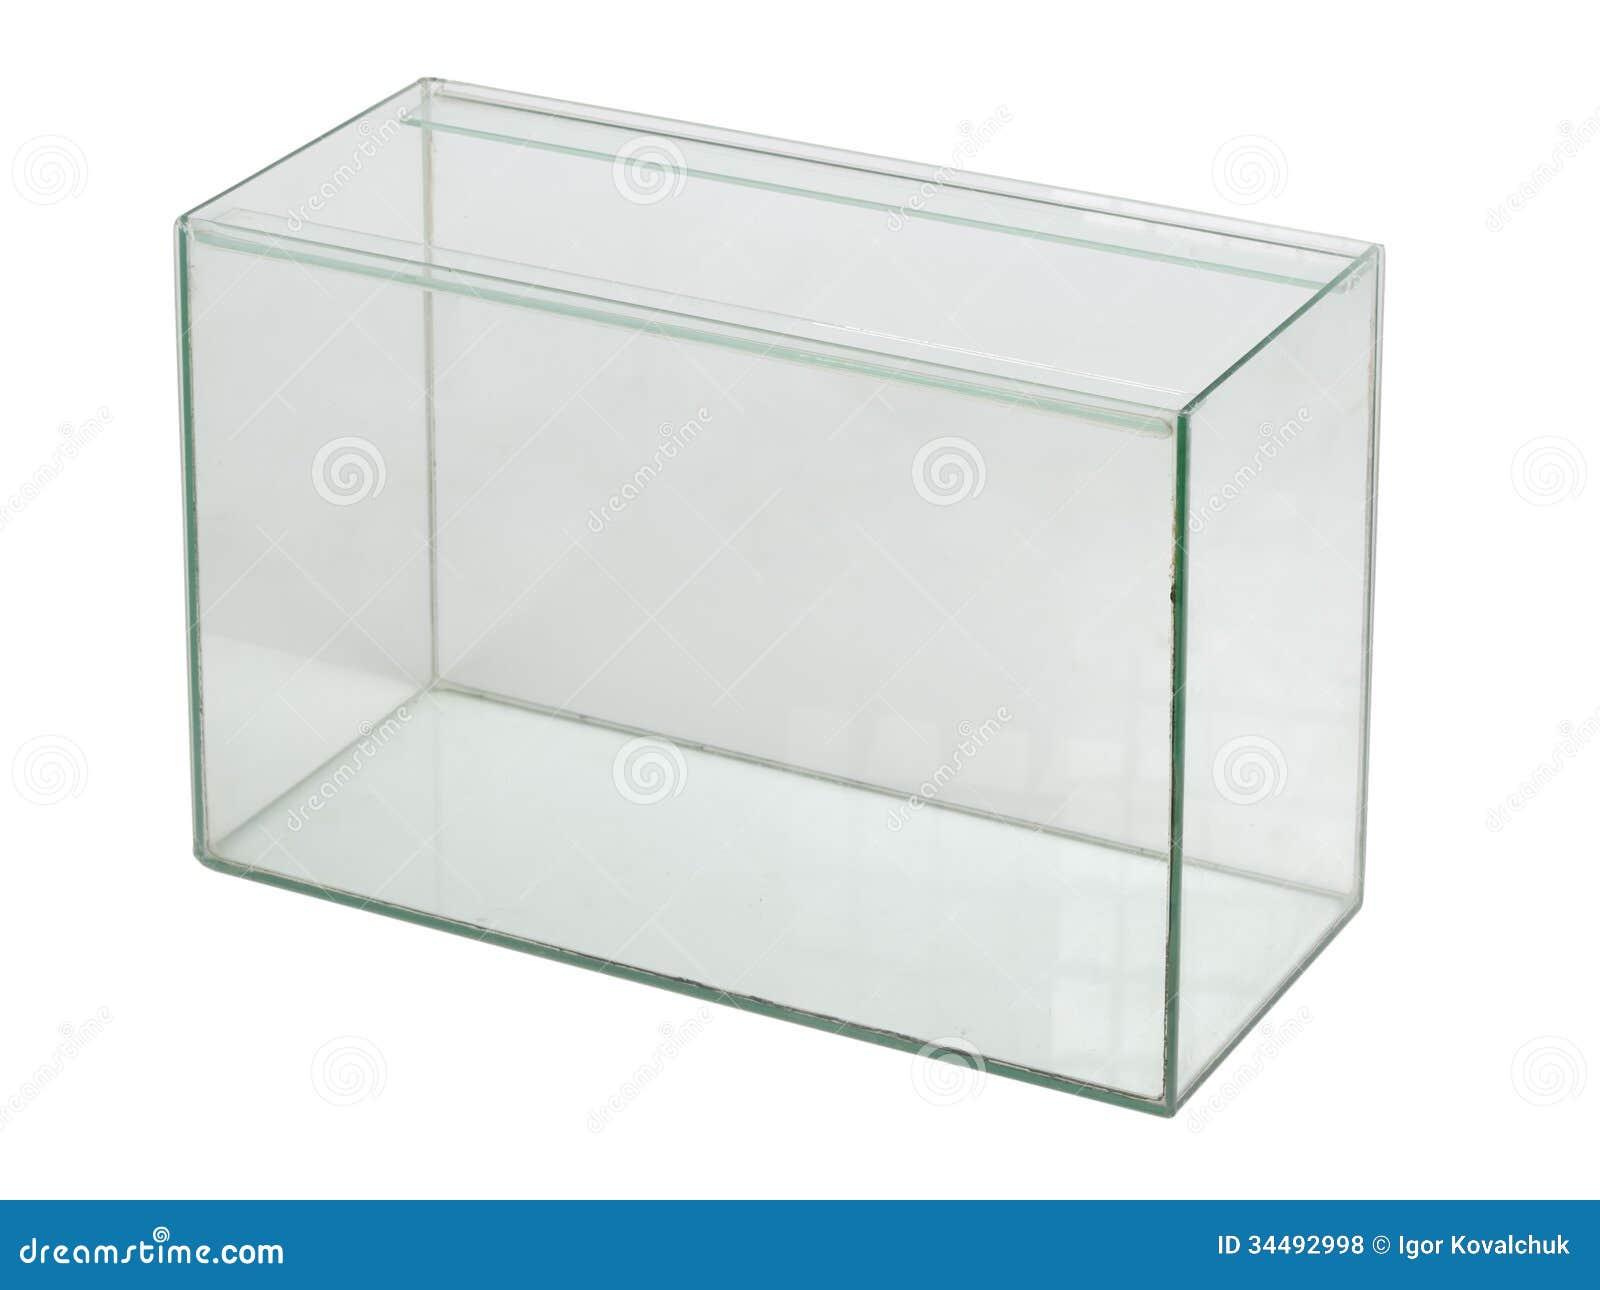 [Obrazek: empty-aquarium-isolated-white-background-34492998.jpg]